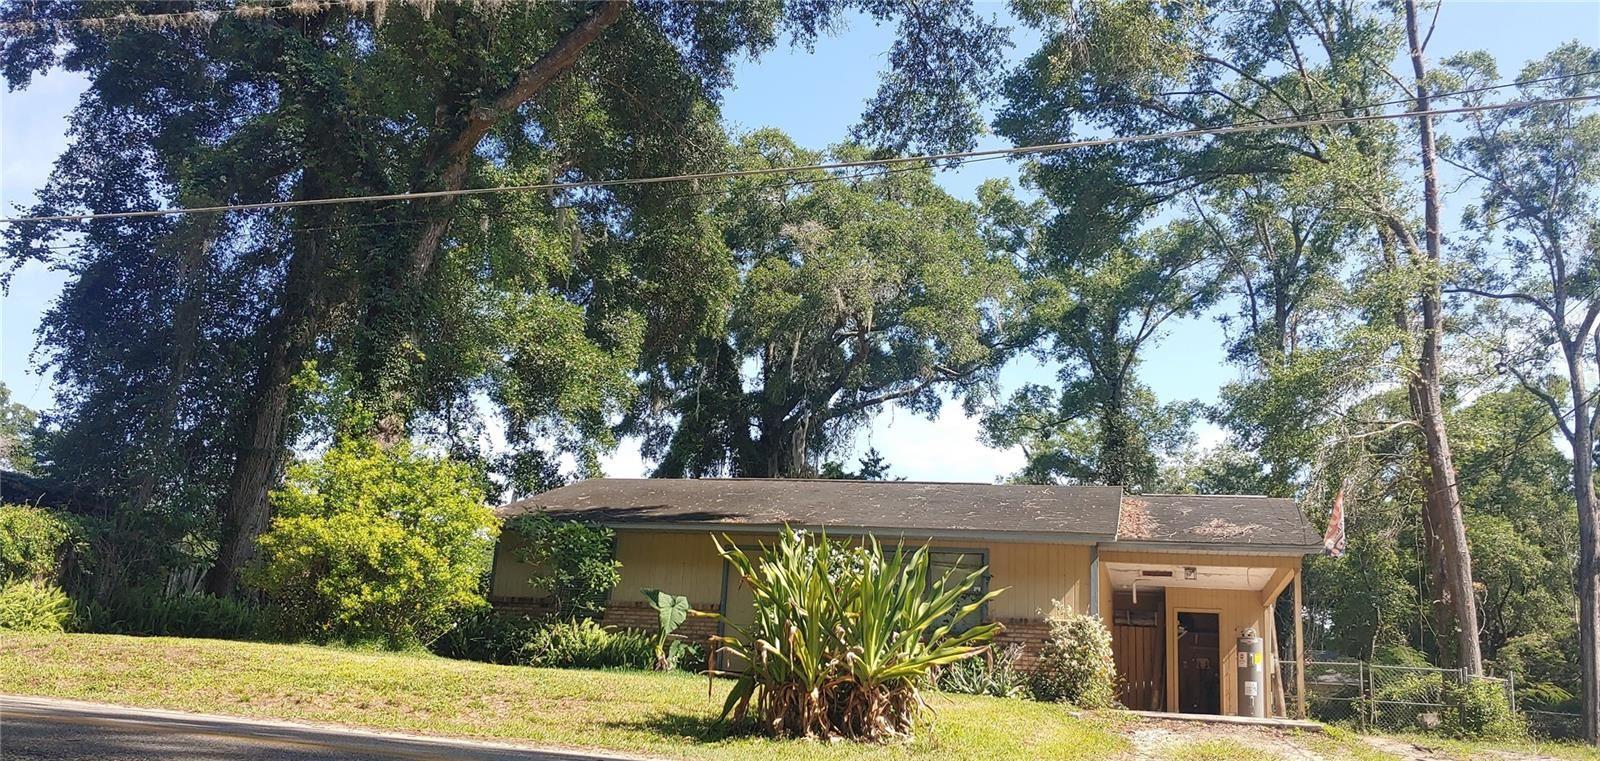 5453 NW 53RD STREET, Ocala, FL 34482 - MLS#: OM620228